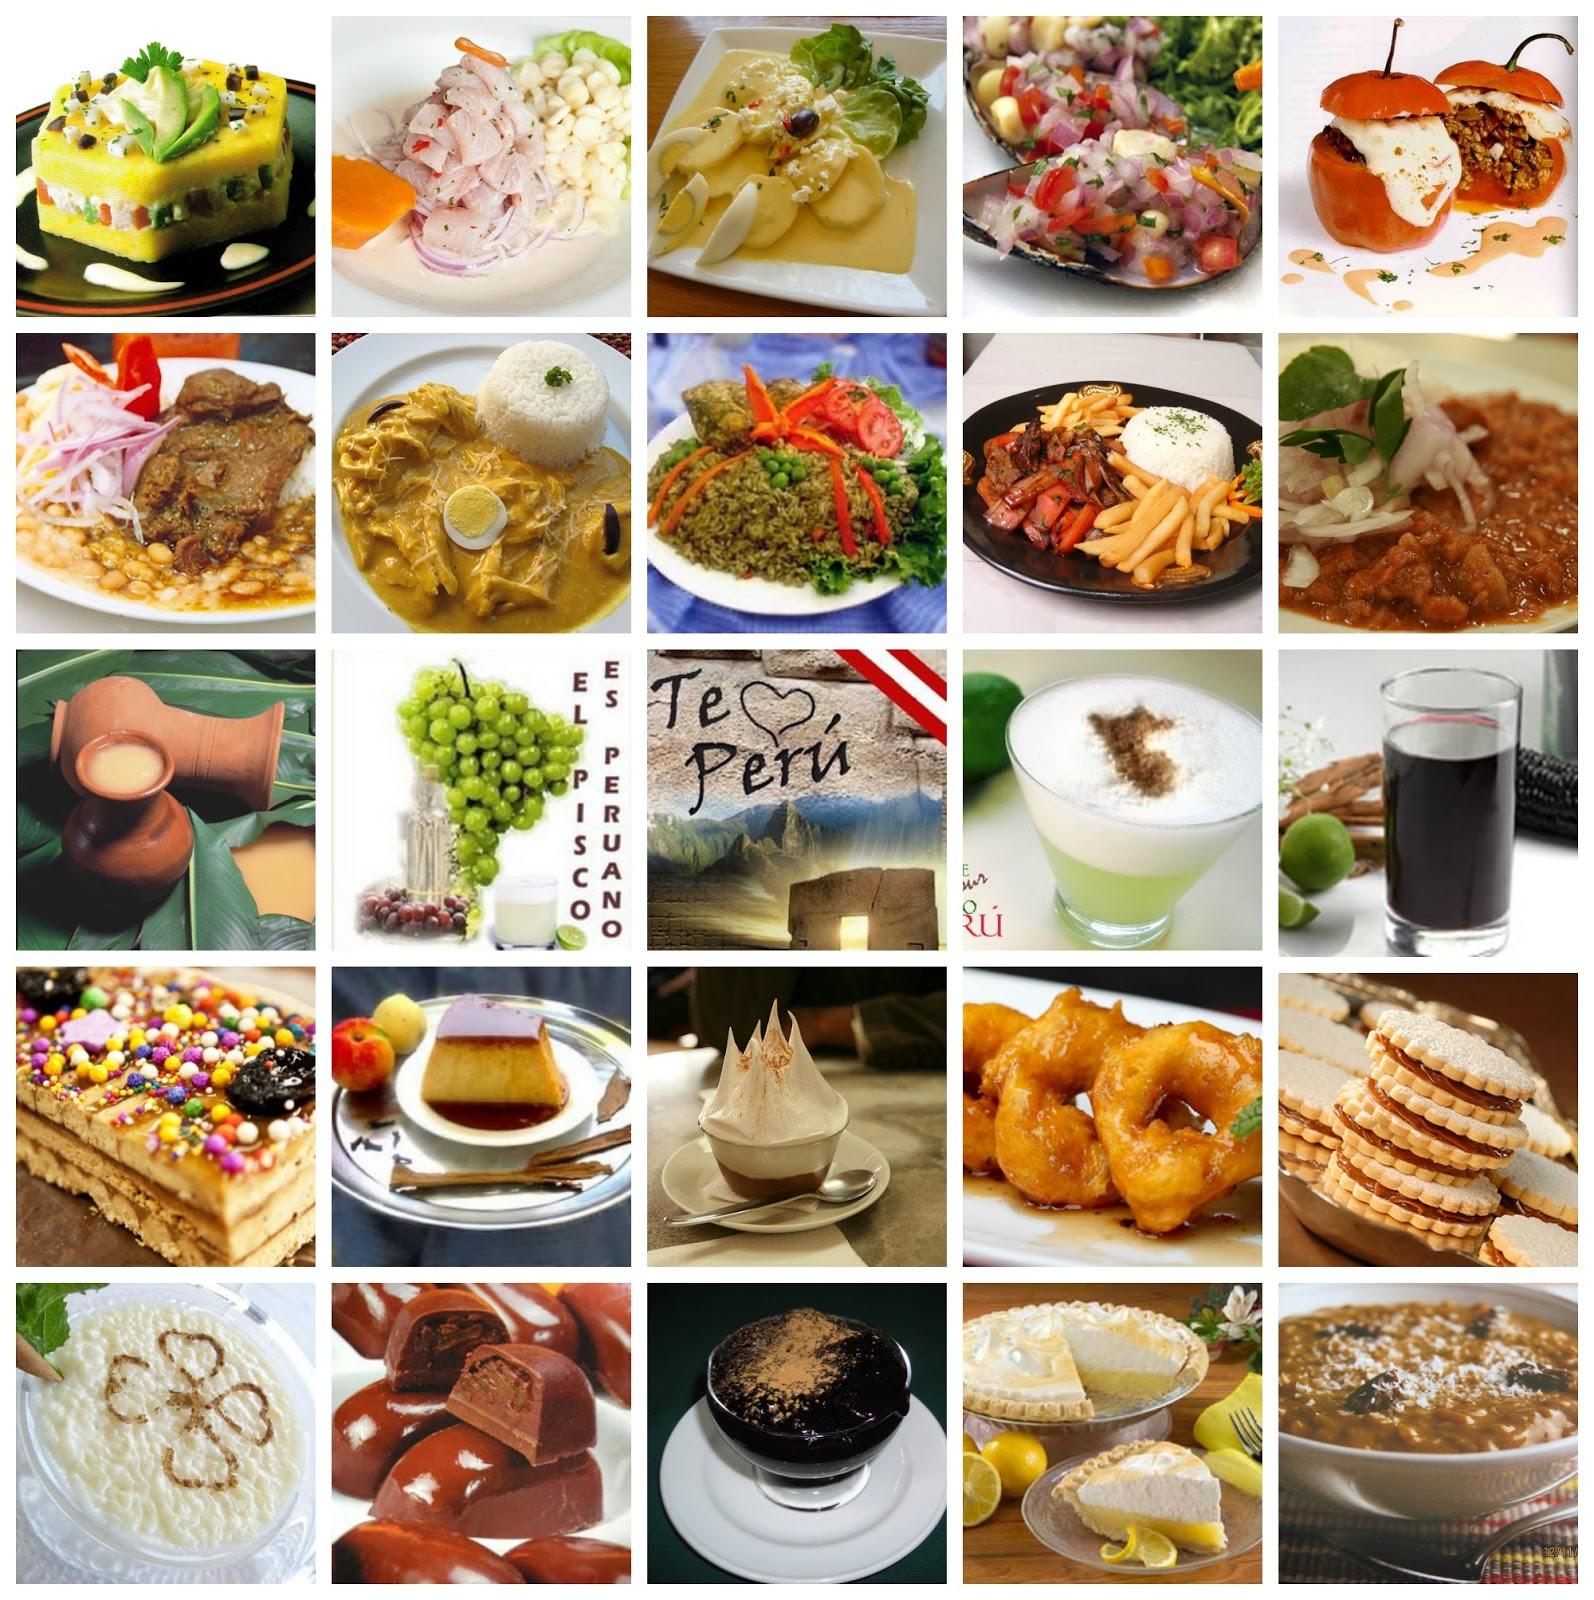 peruvian food comida peruana buy foods groceries - HD1594×1600